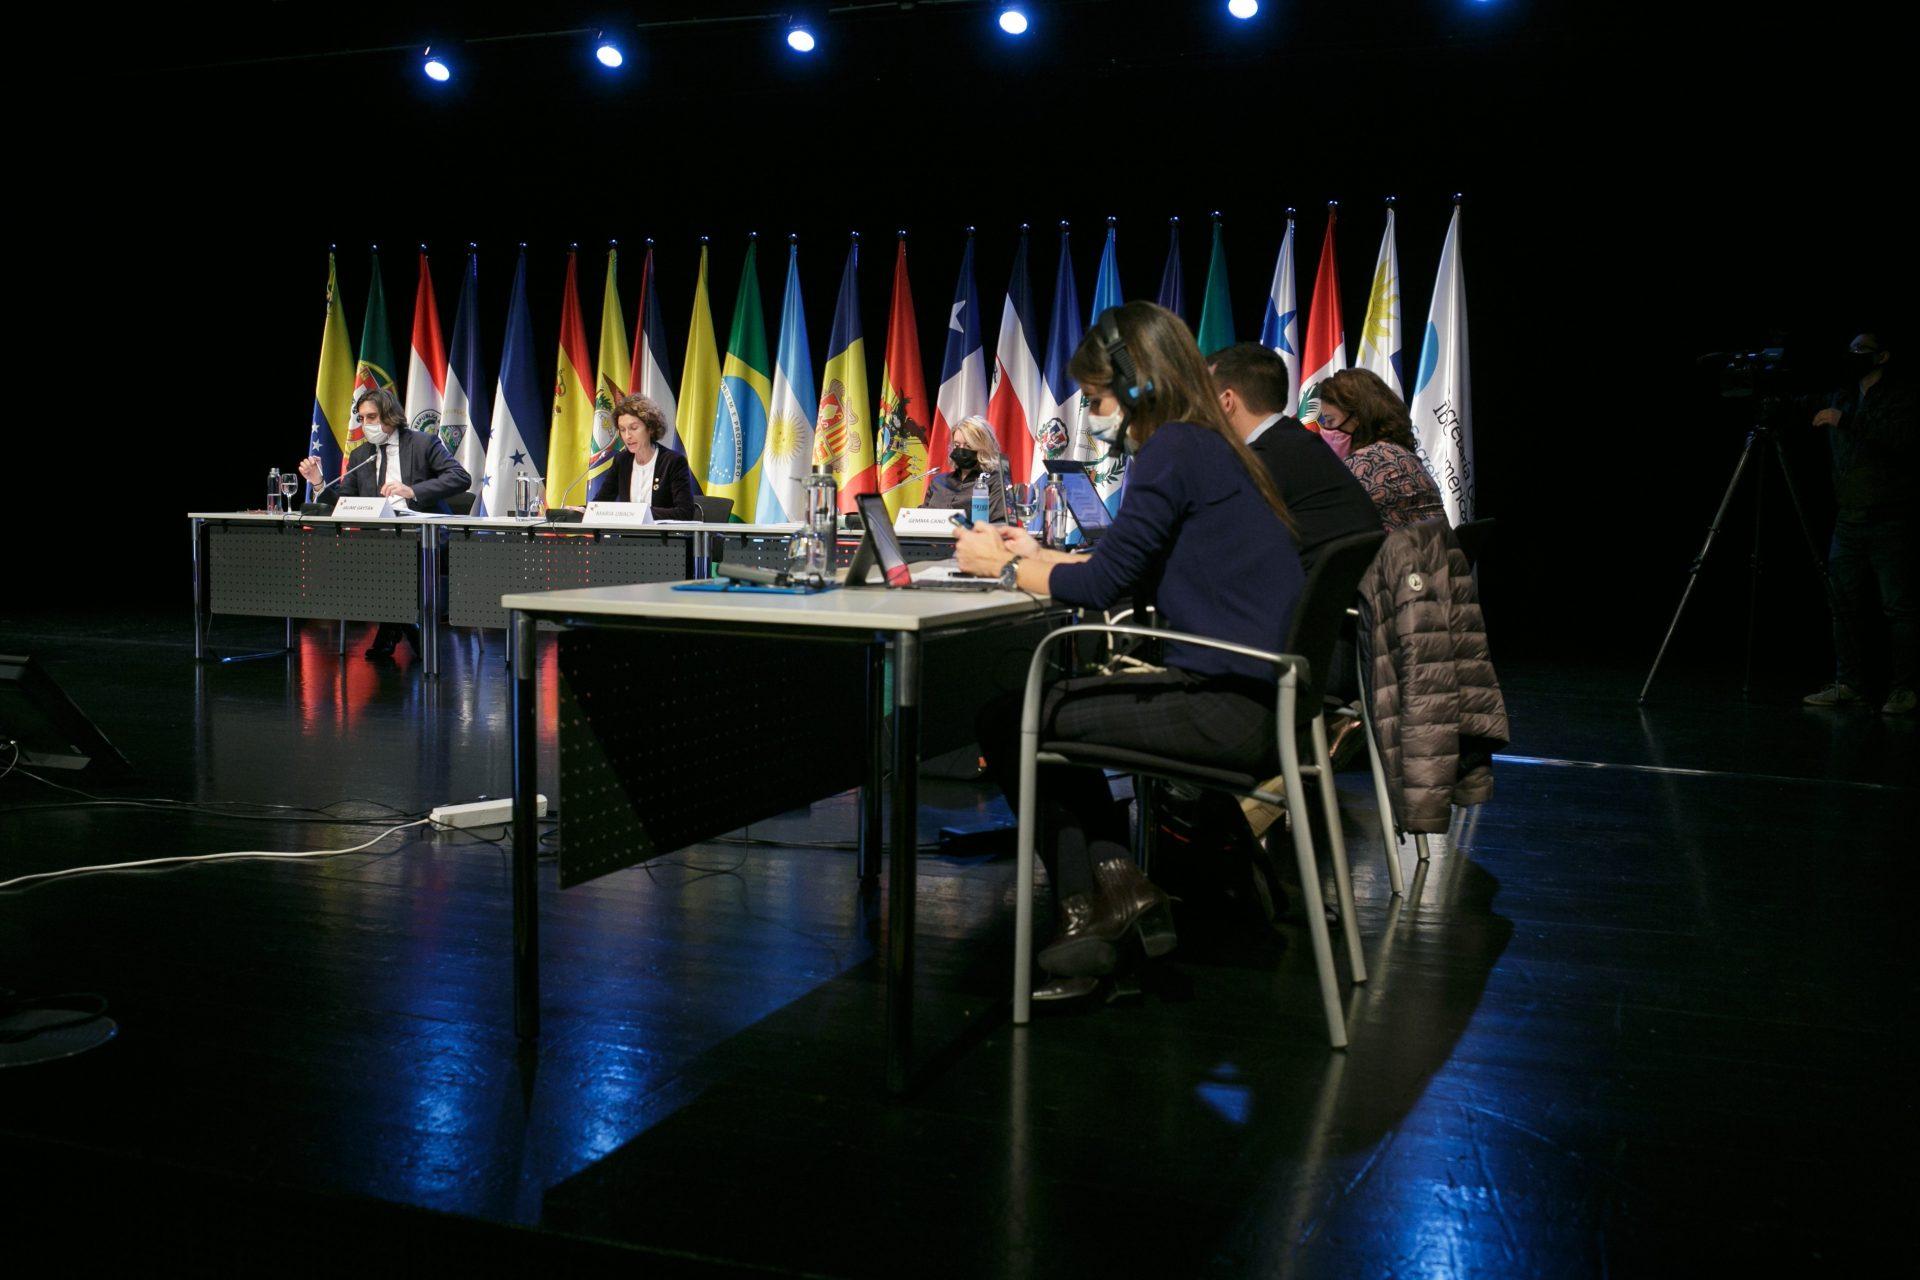 Reunión Extraordinaria de ministros de Asuntos Exteriores de la Conferencia Iberoamericana. Foto:SFGA/CEsteve/CEDIDA/SOLO USO EDITORIAL